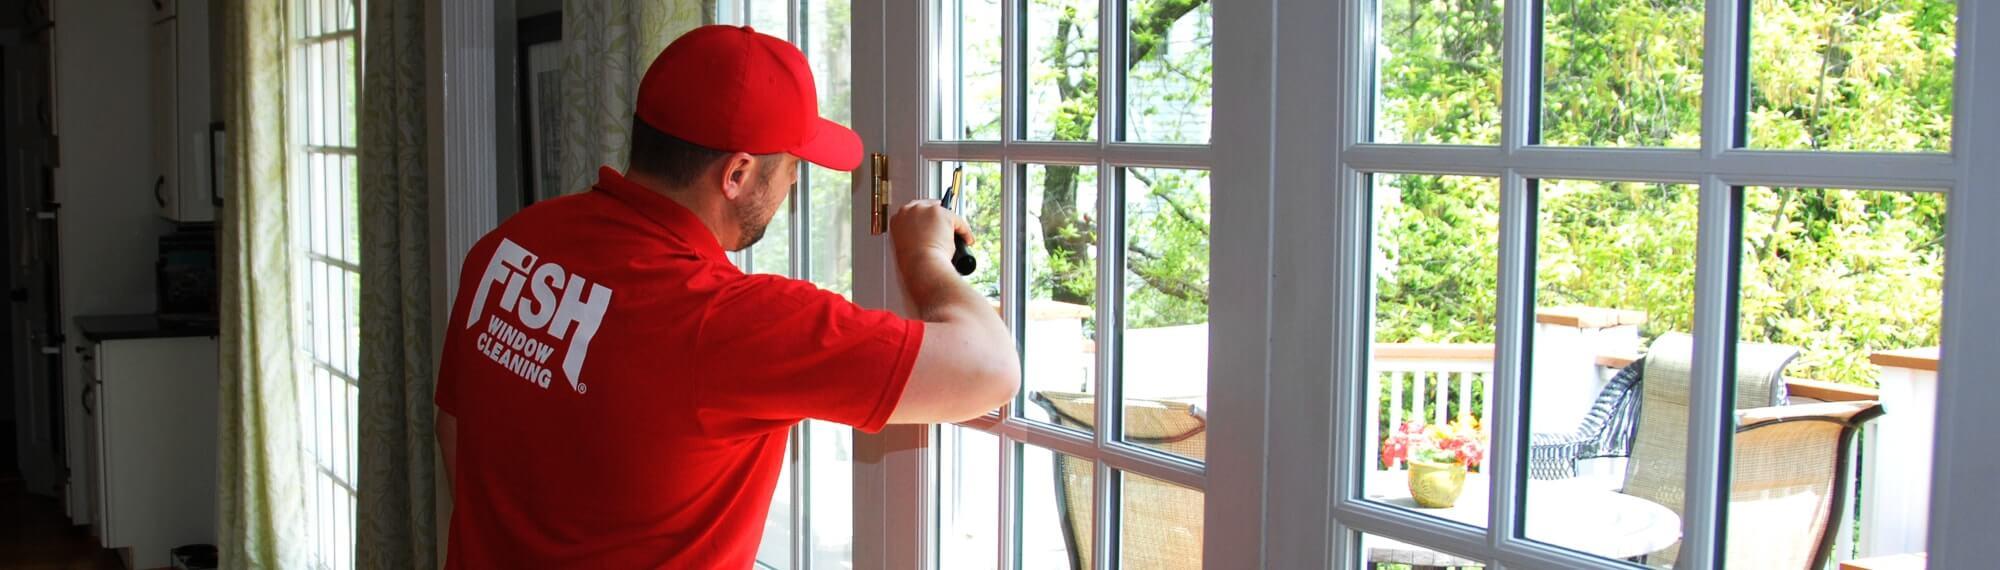 Fish Window Cleaning Bothell Wa Woodinville Kirkland